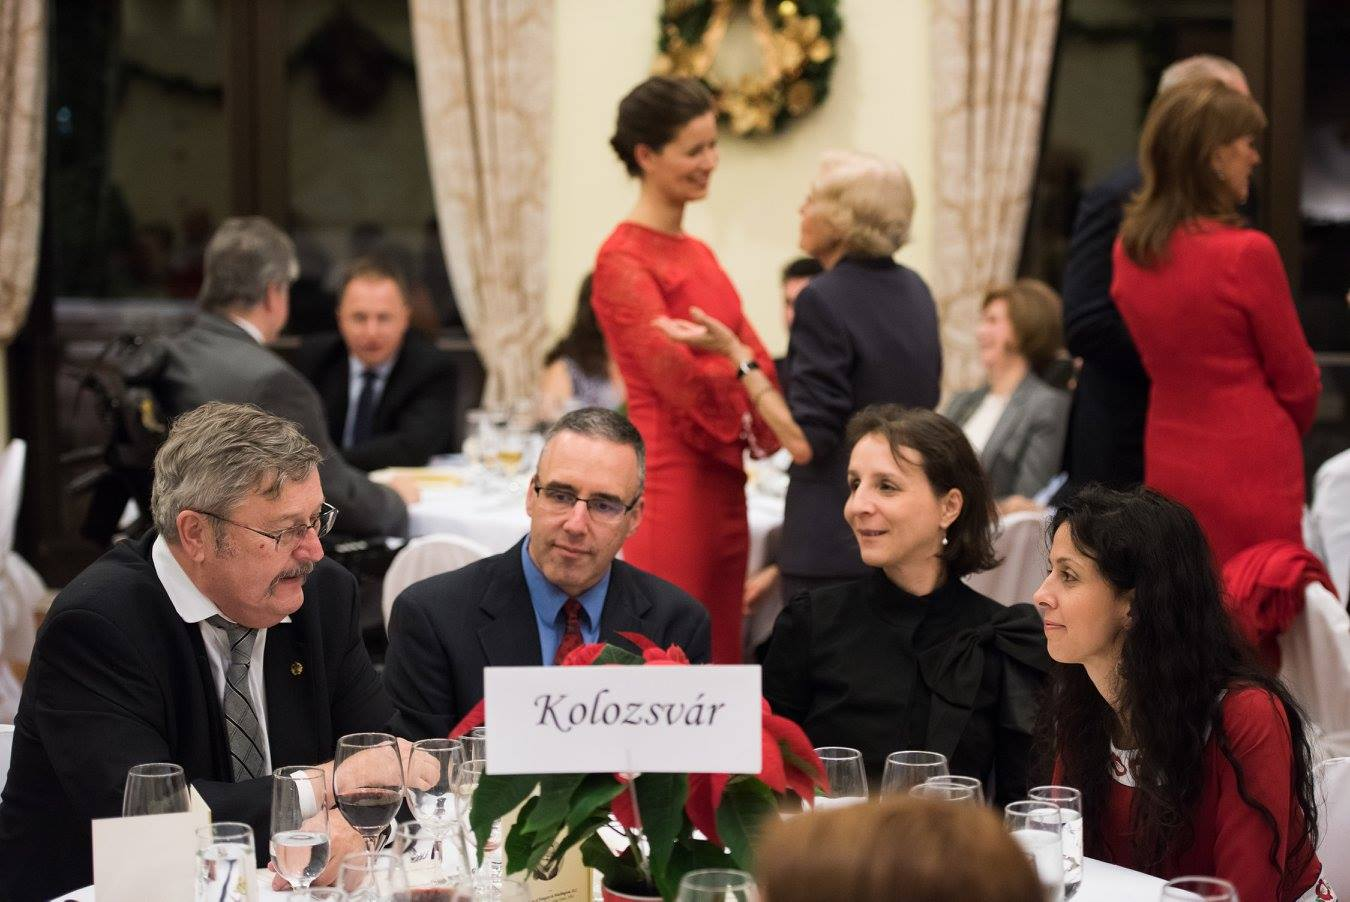 Mr. Imre Lendvai-Lintner, Dr. Endre Szentkirályi, Ms. Judit Czakó, Ms. Zsófia Koncz